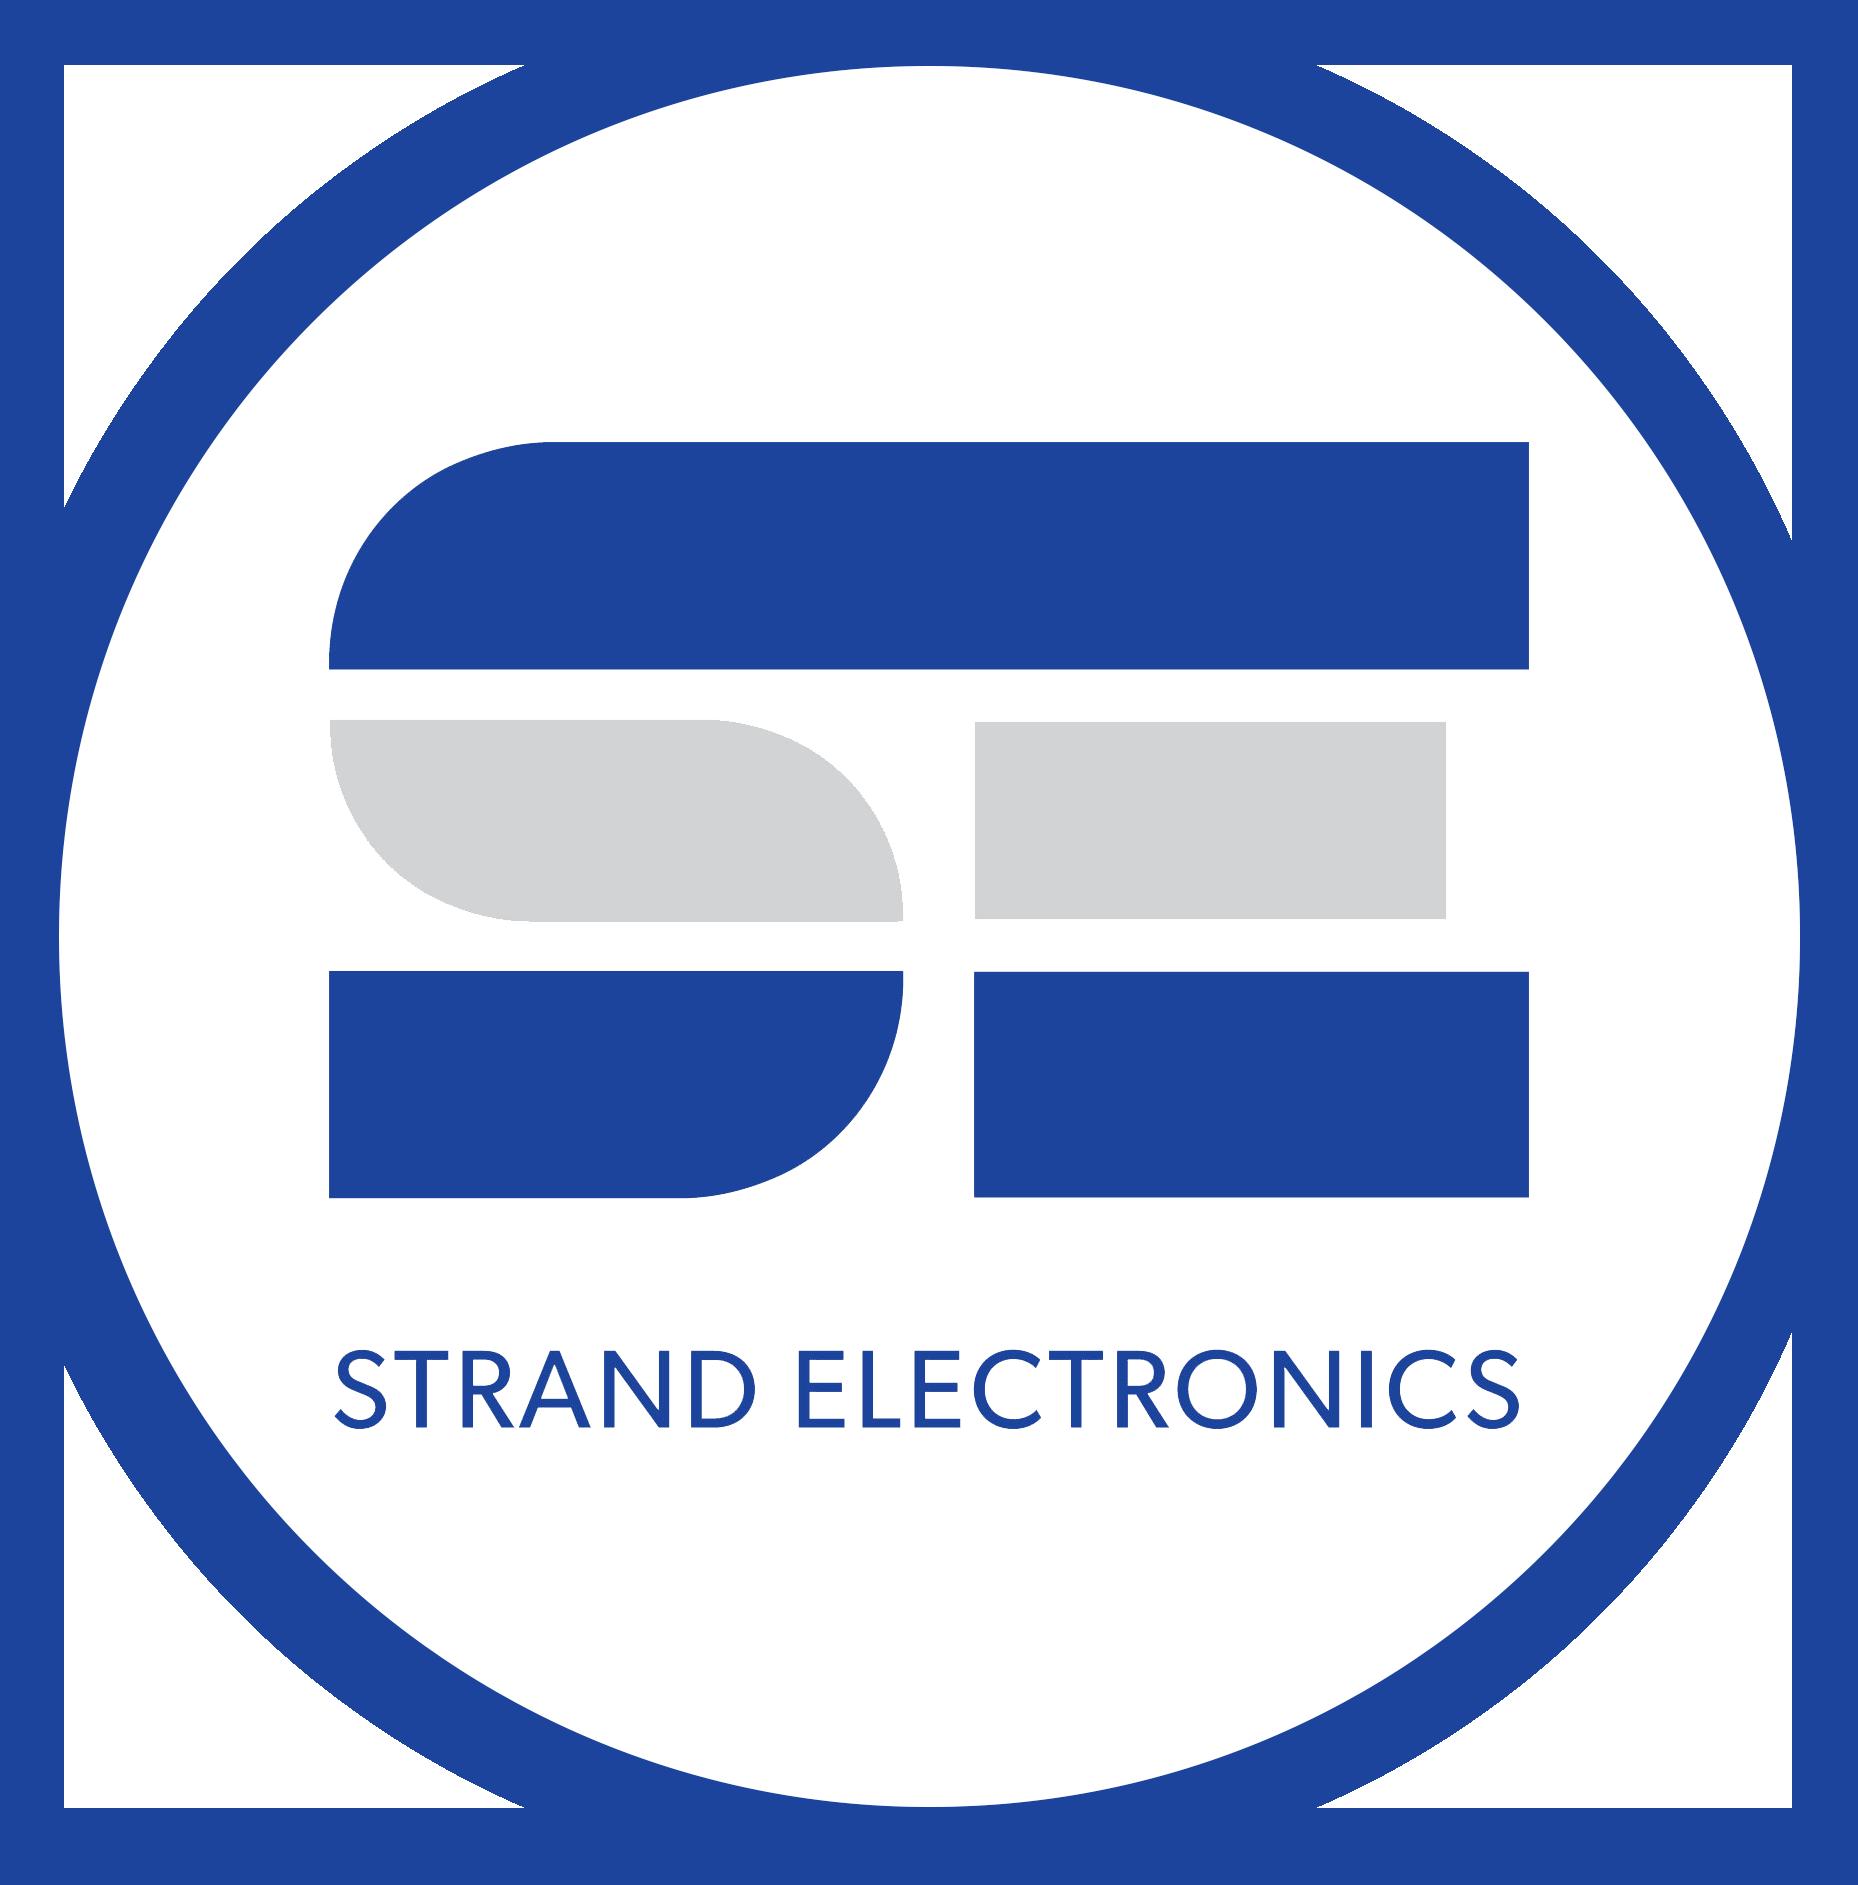 Strand Electronics